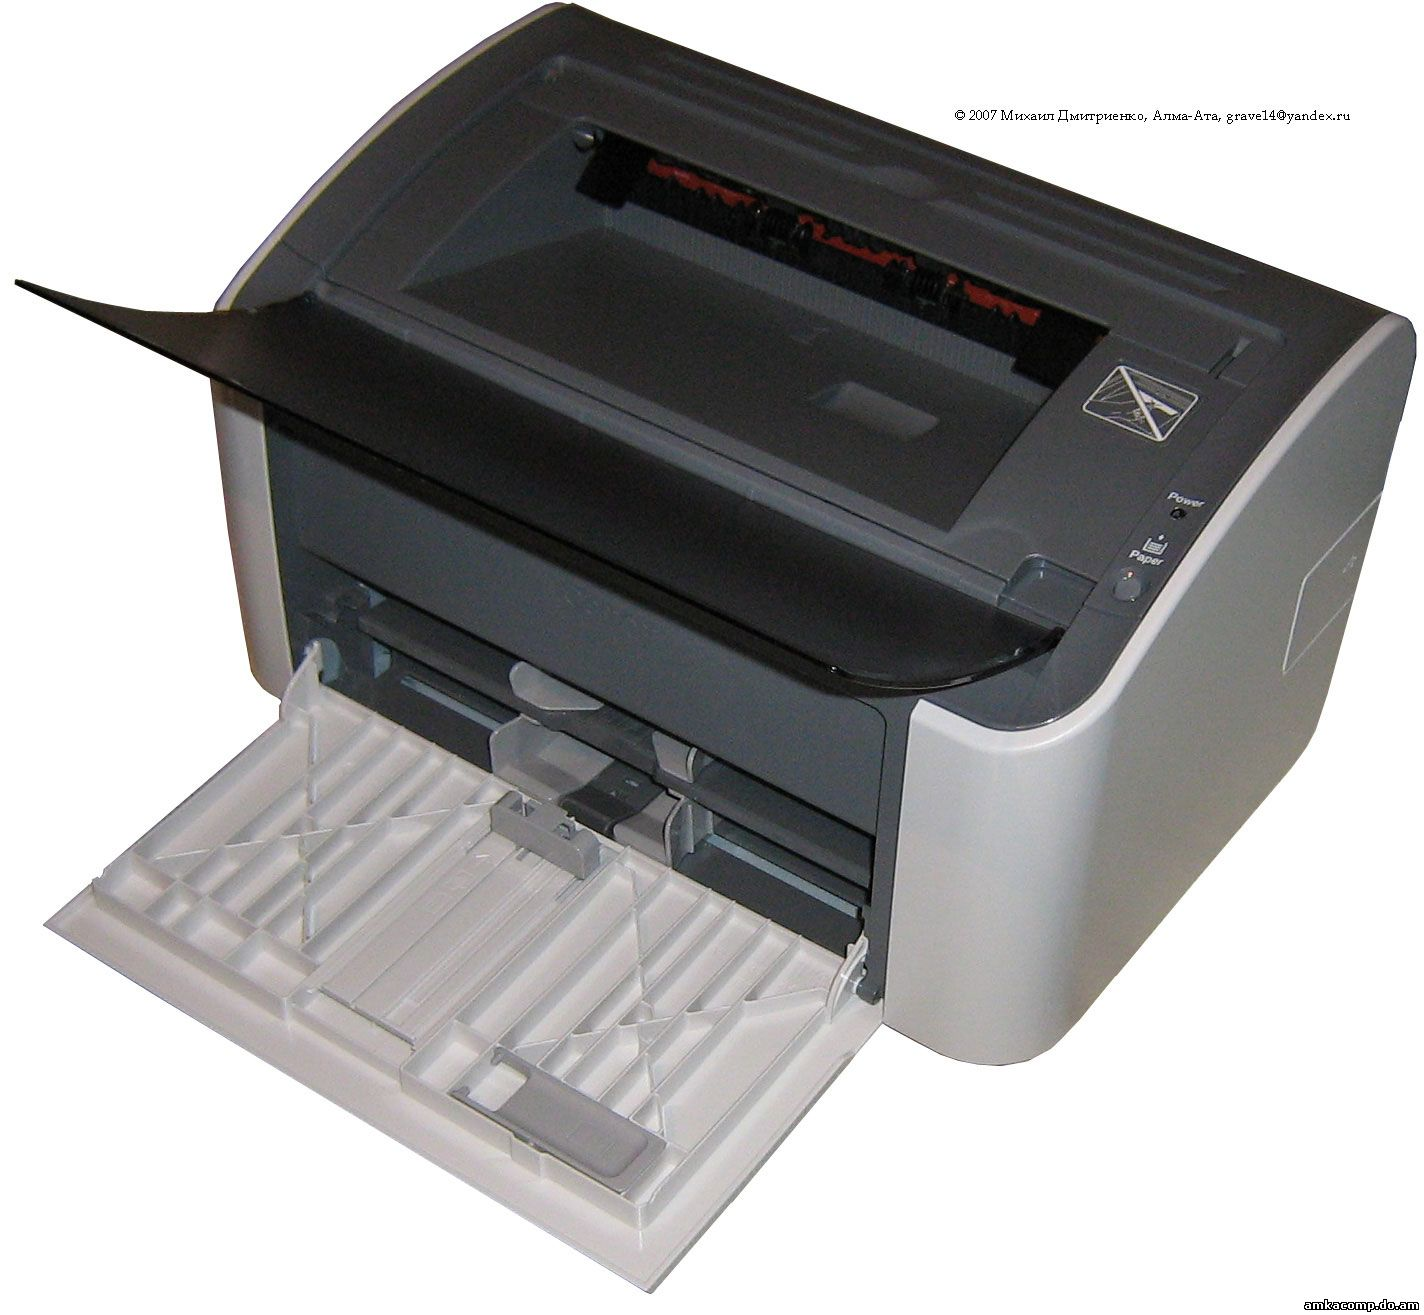 скачать драйвер canon lbp-810 printer driver xp